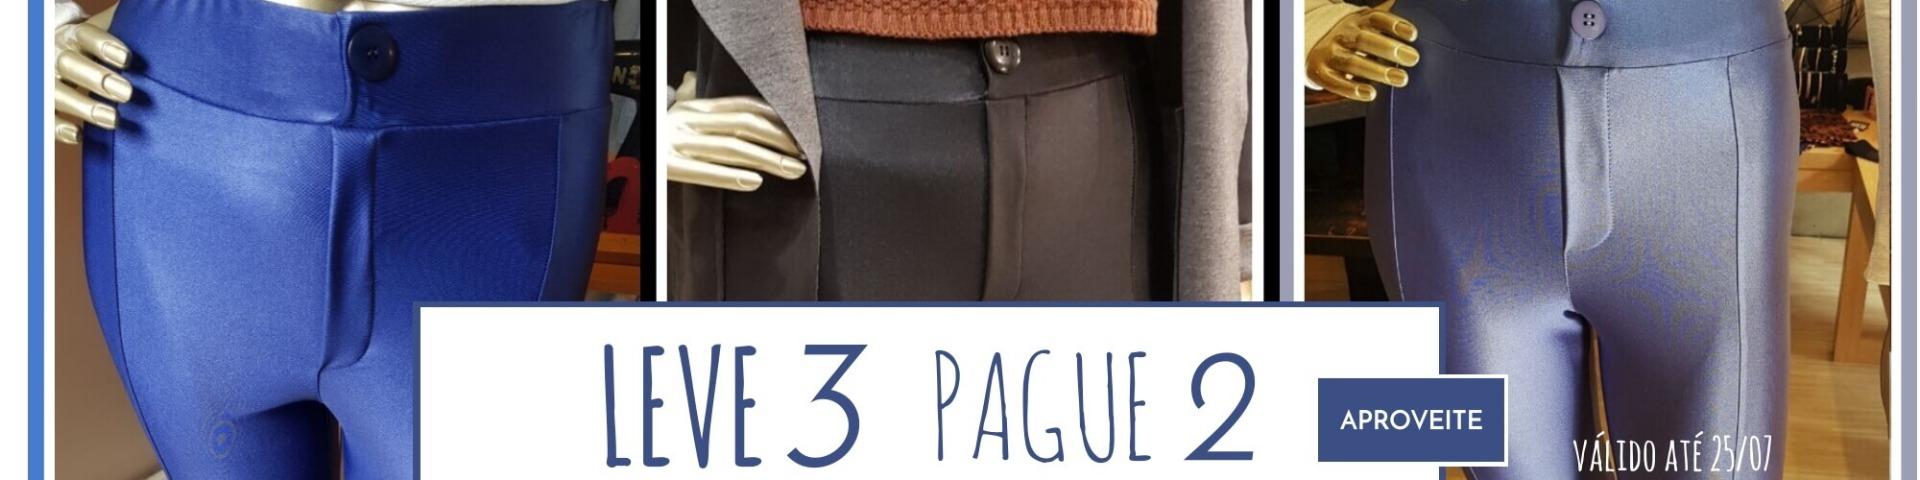 Promo Benne - Leve 3 Pague 2